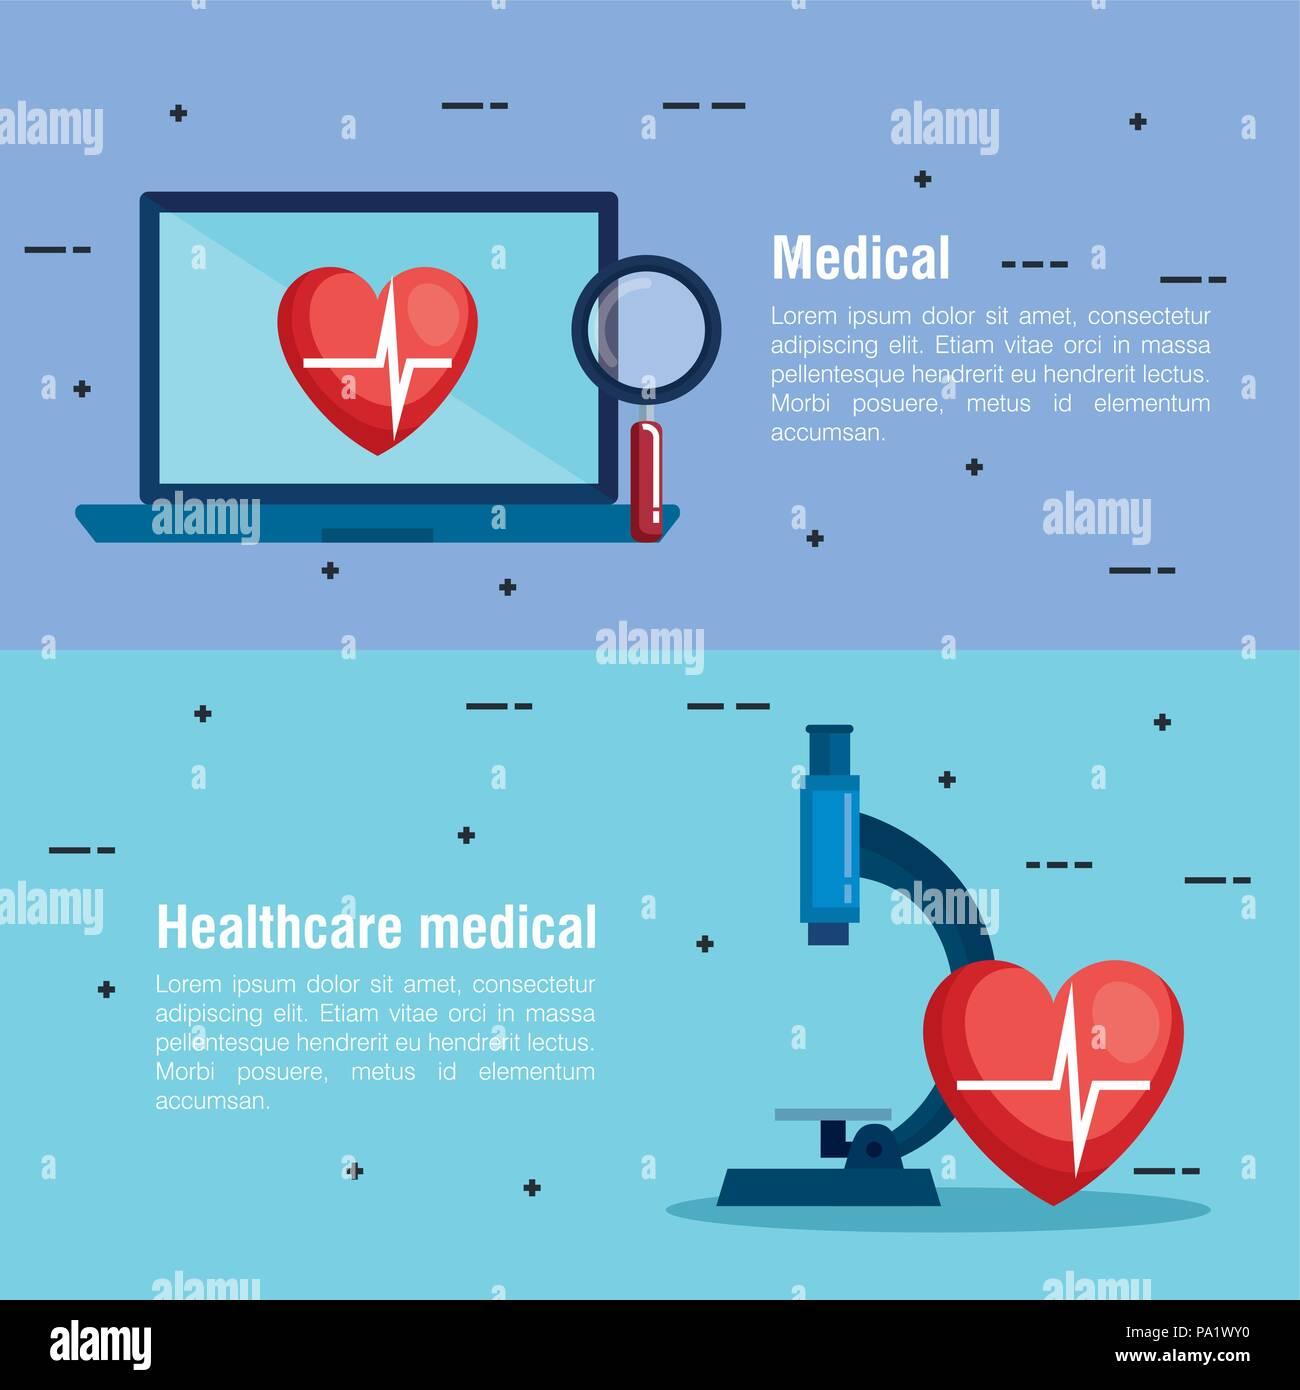 laptop with telemedicine icons - Stock Image